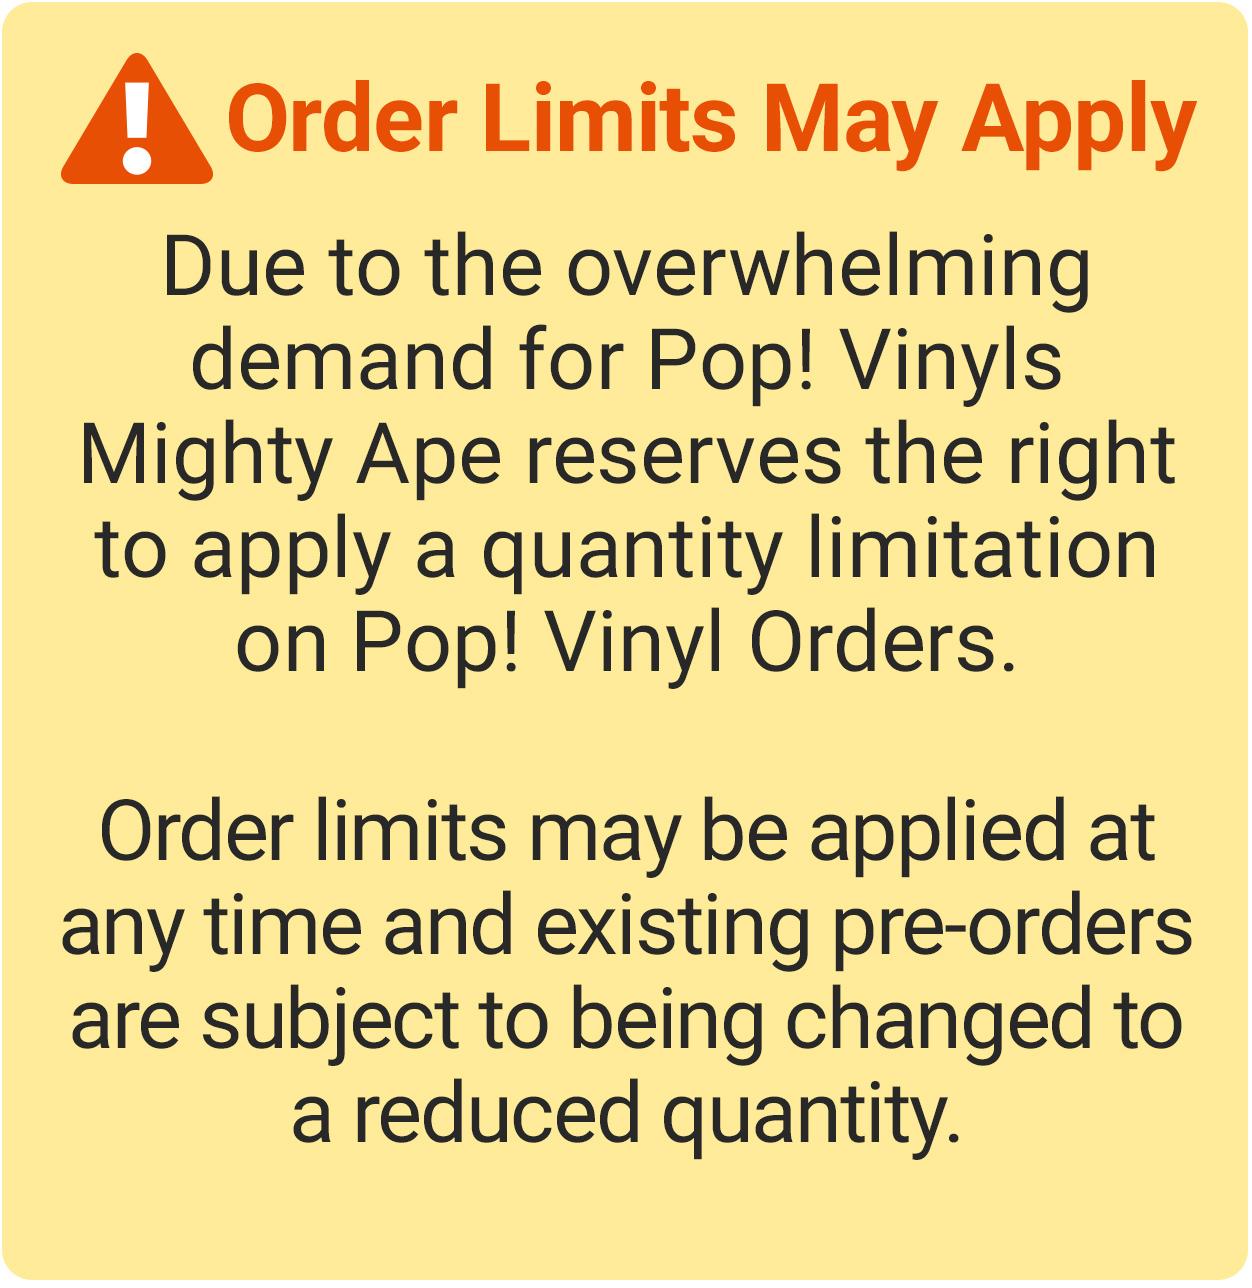 Avatar: Cabbage Man & Cart - Pop! Vinyl 2-Pack image